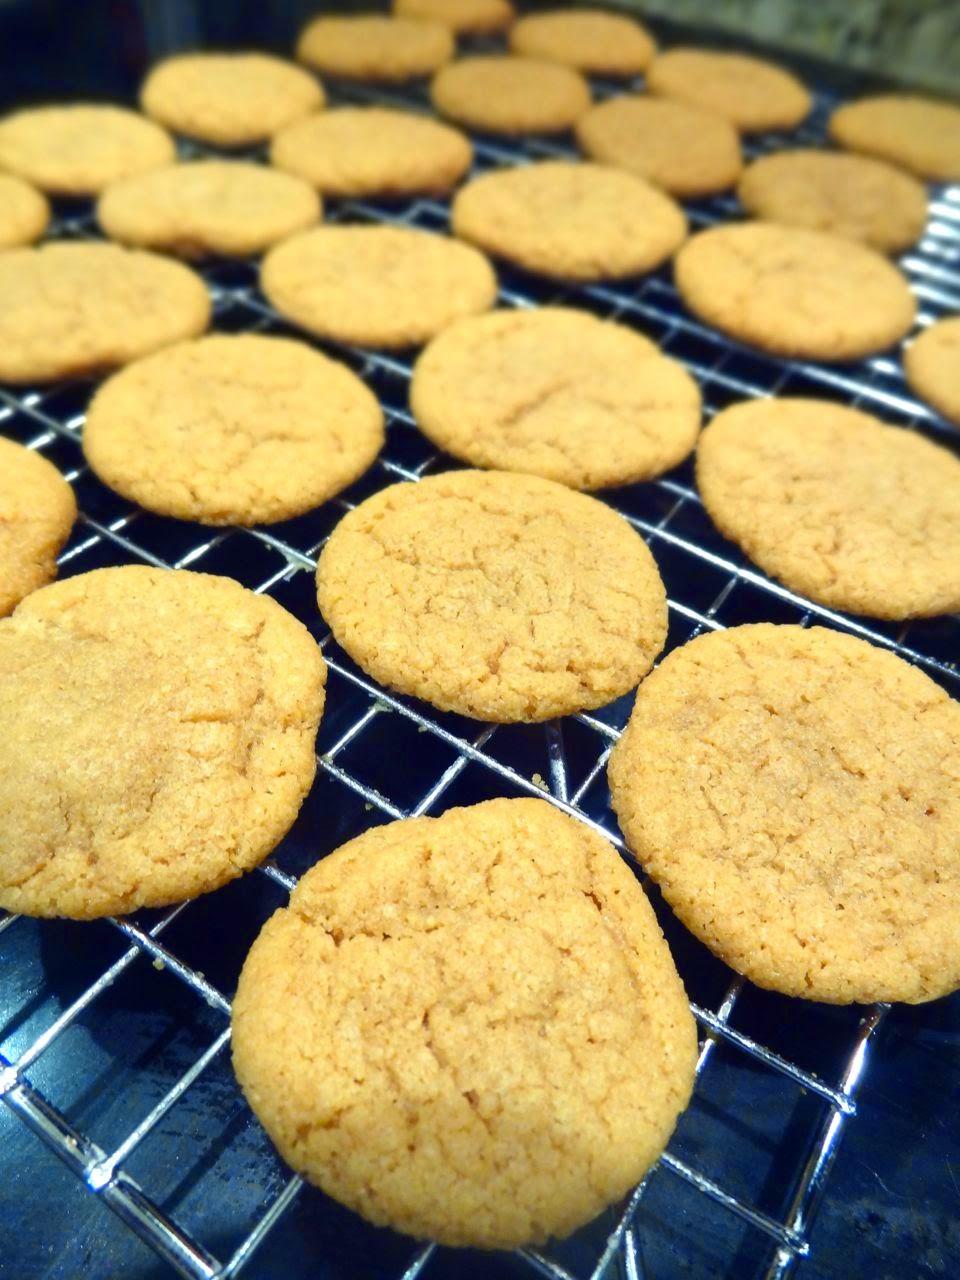 Scrumpdillyicious: Gluten-Free Peanut Butter Cookies